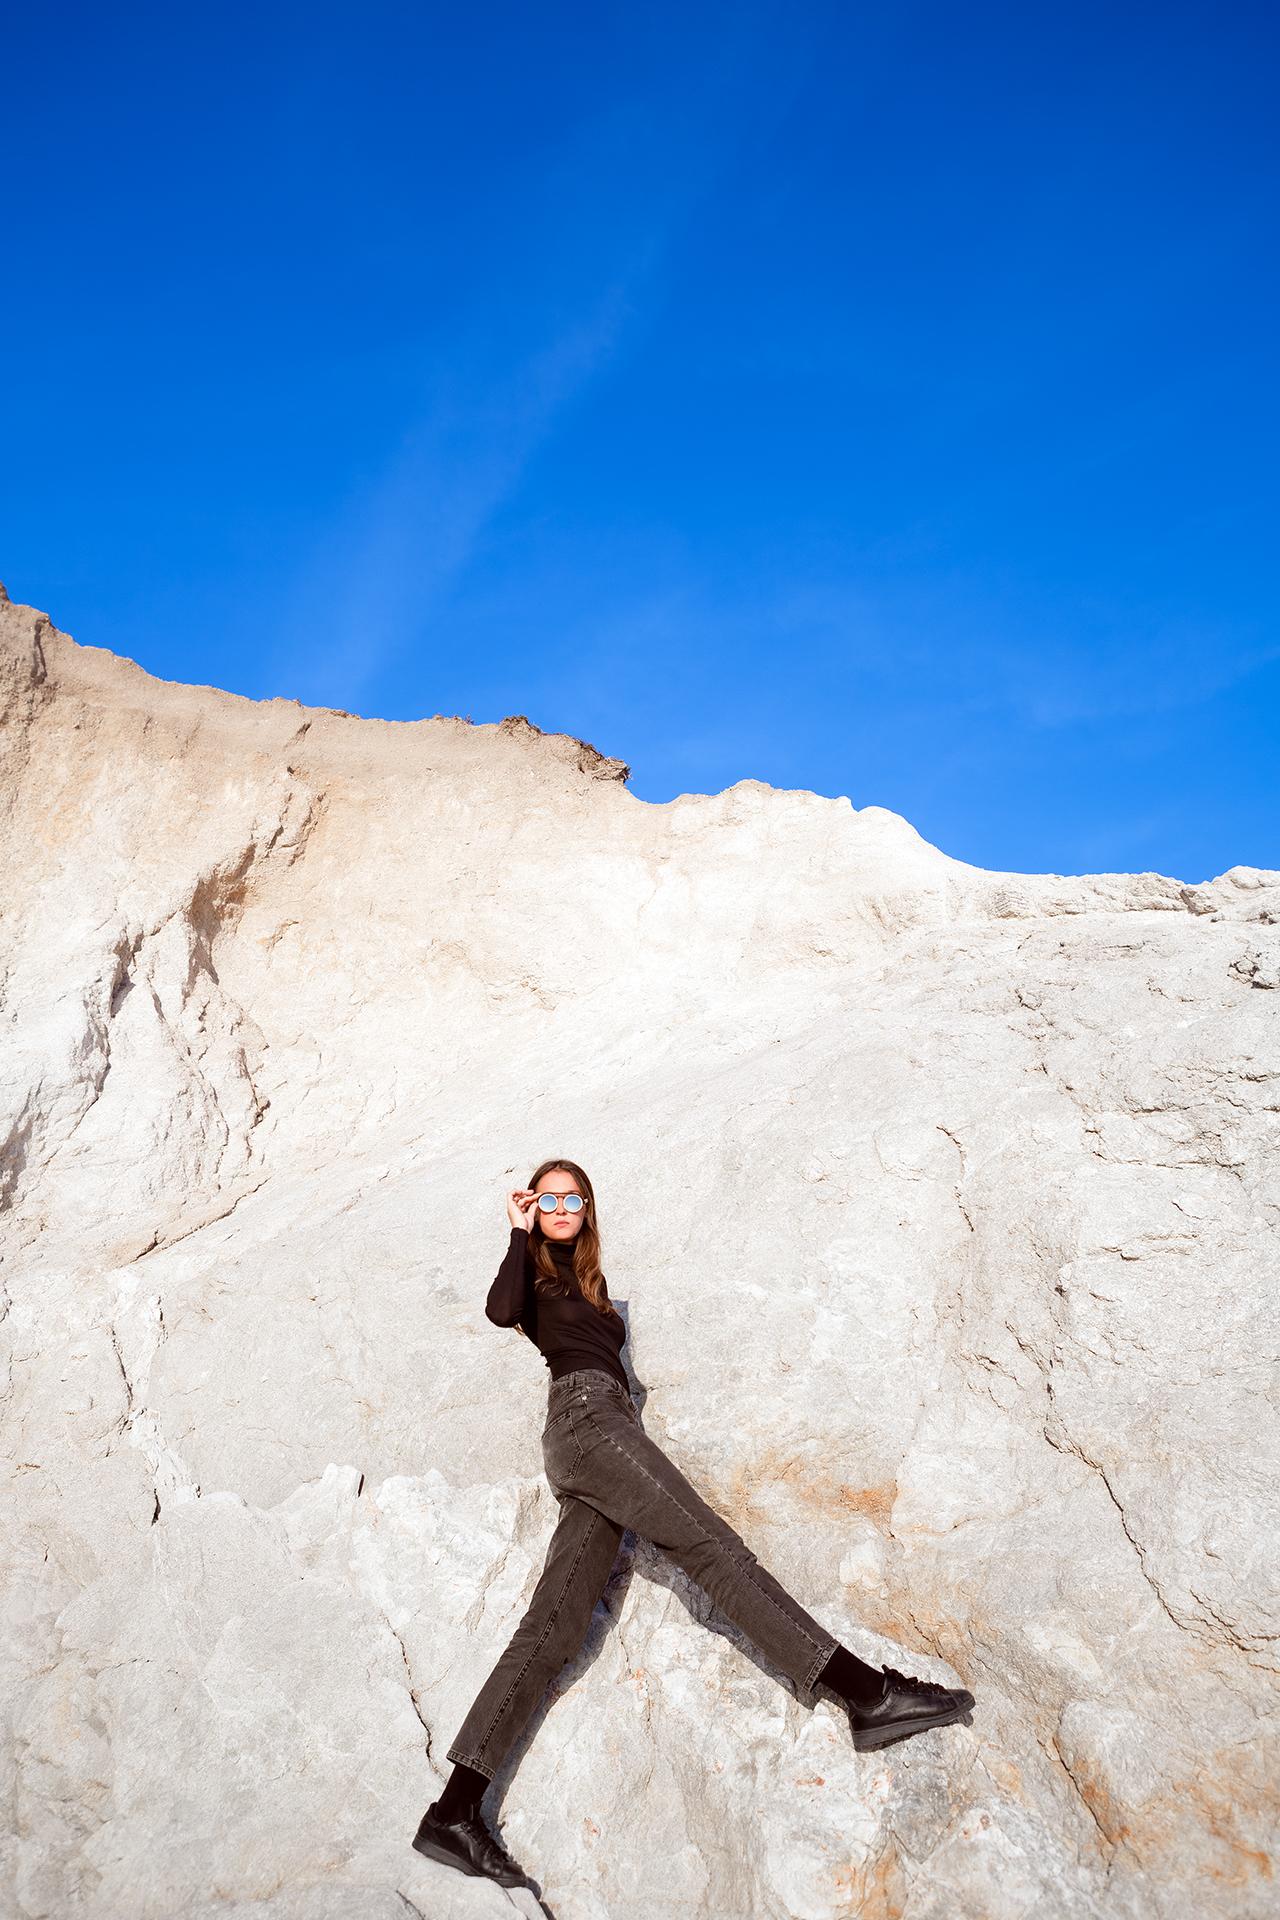 samuellstudio_samuell_©samuel lehuédé_quiberon_cotesauvage_sunglasses_peaks_studiojoranbriand_photography_A00A9007